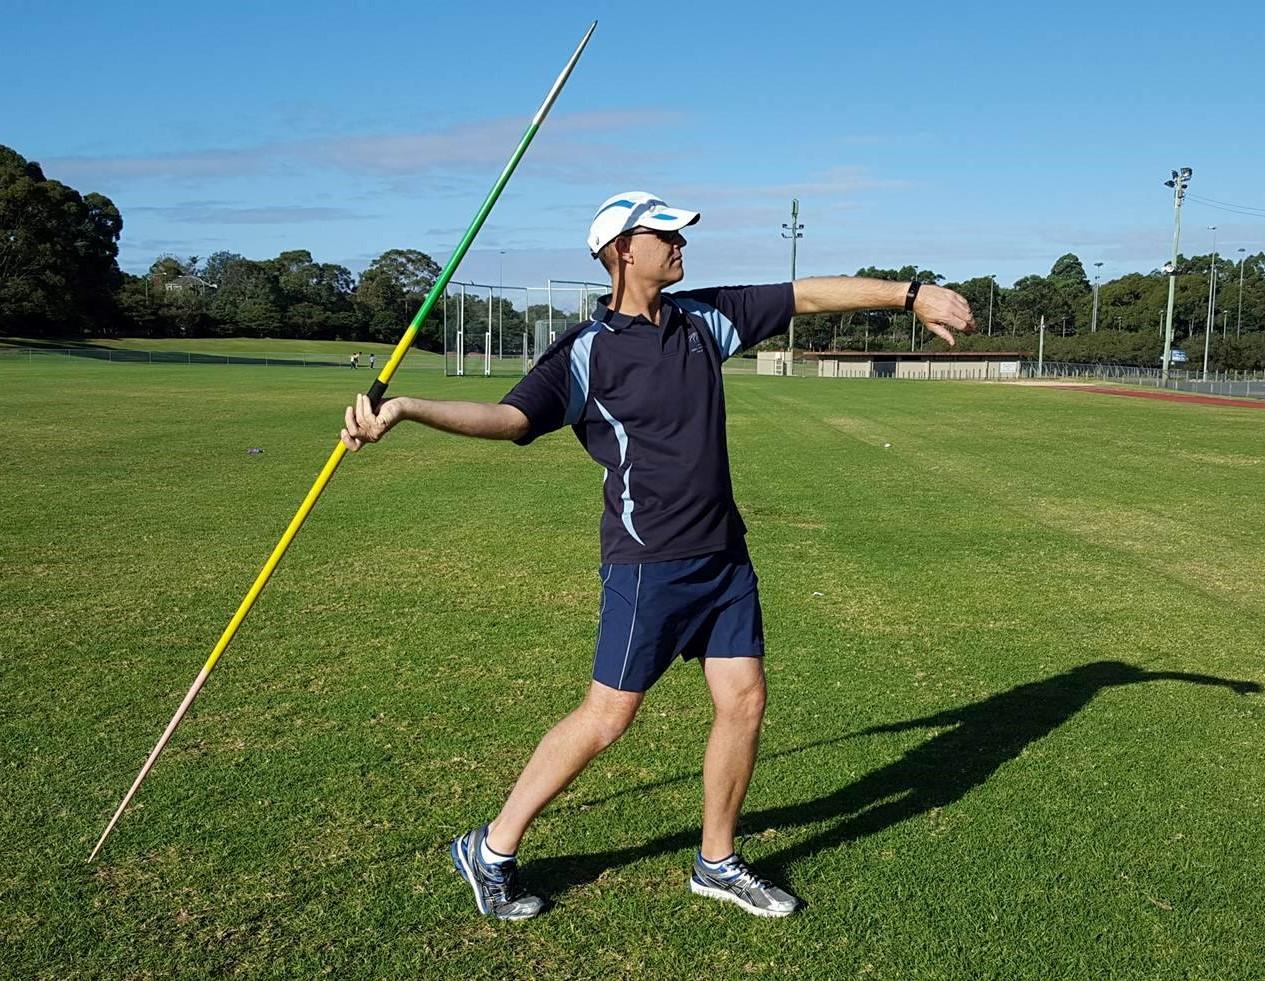 Javelin thrower with javelin tip held too high